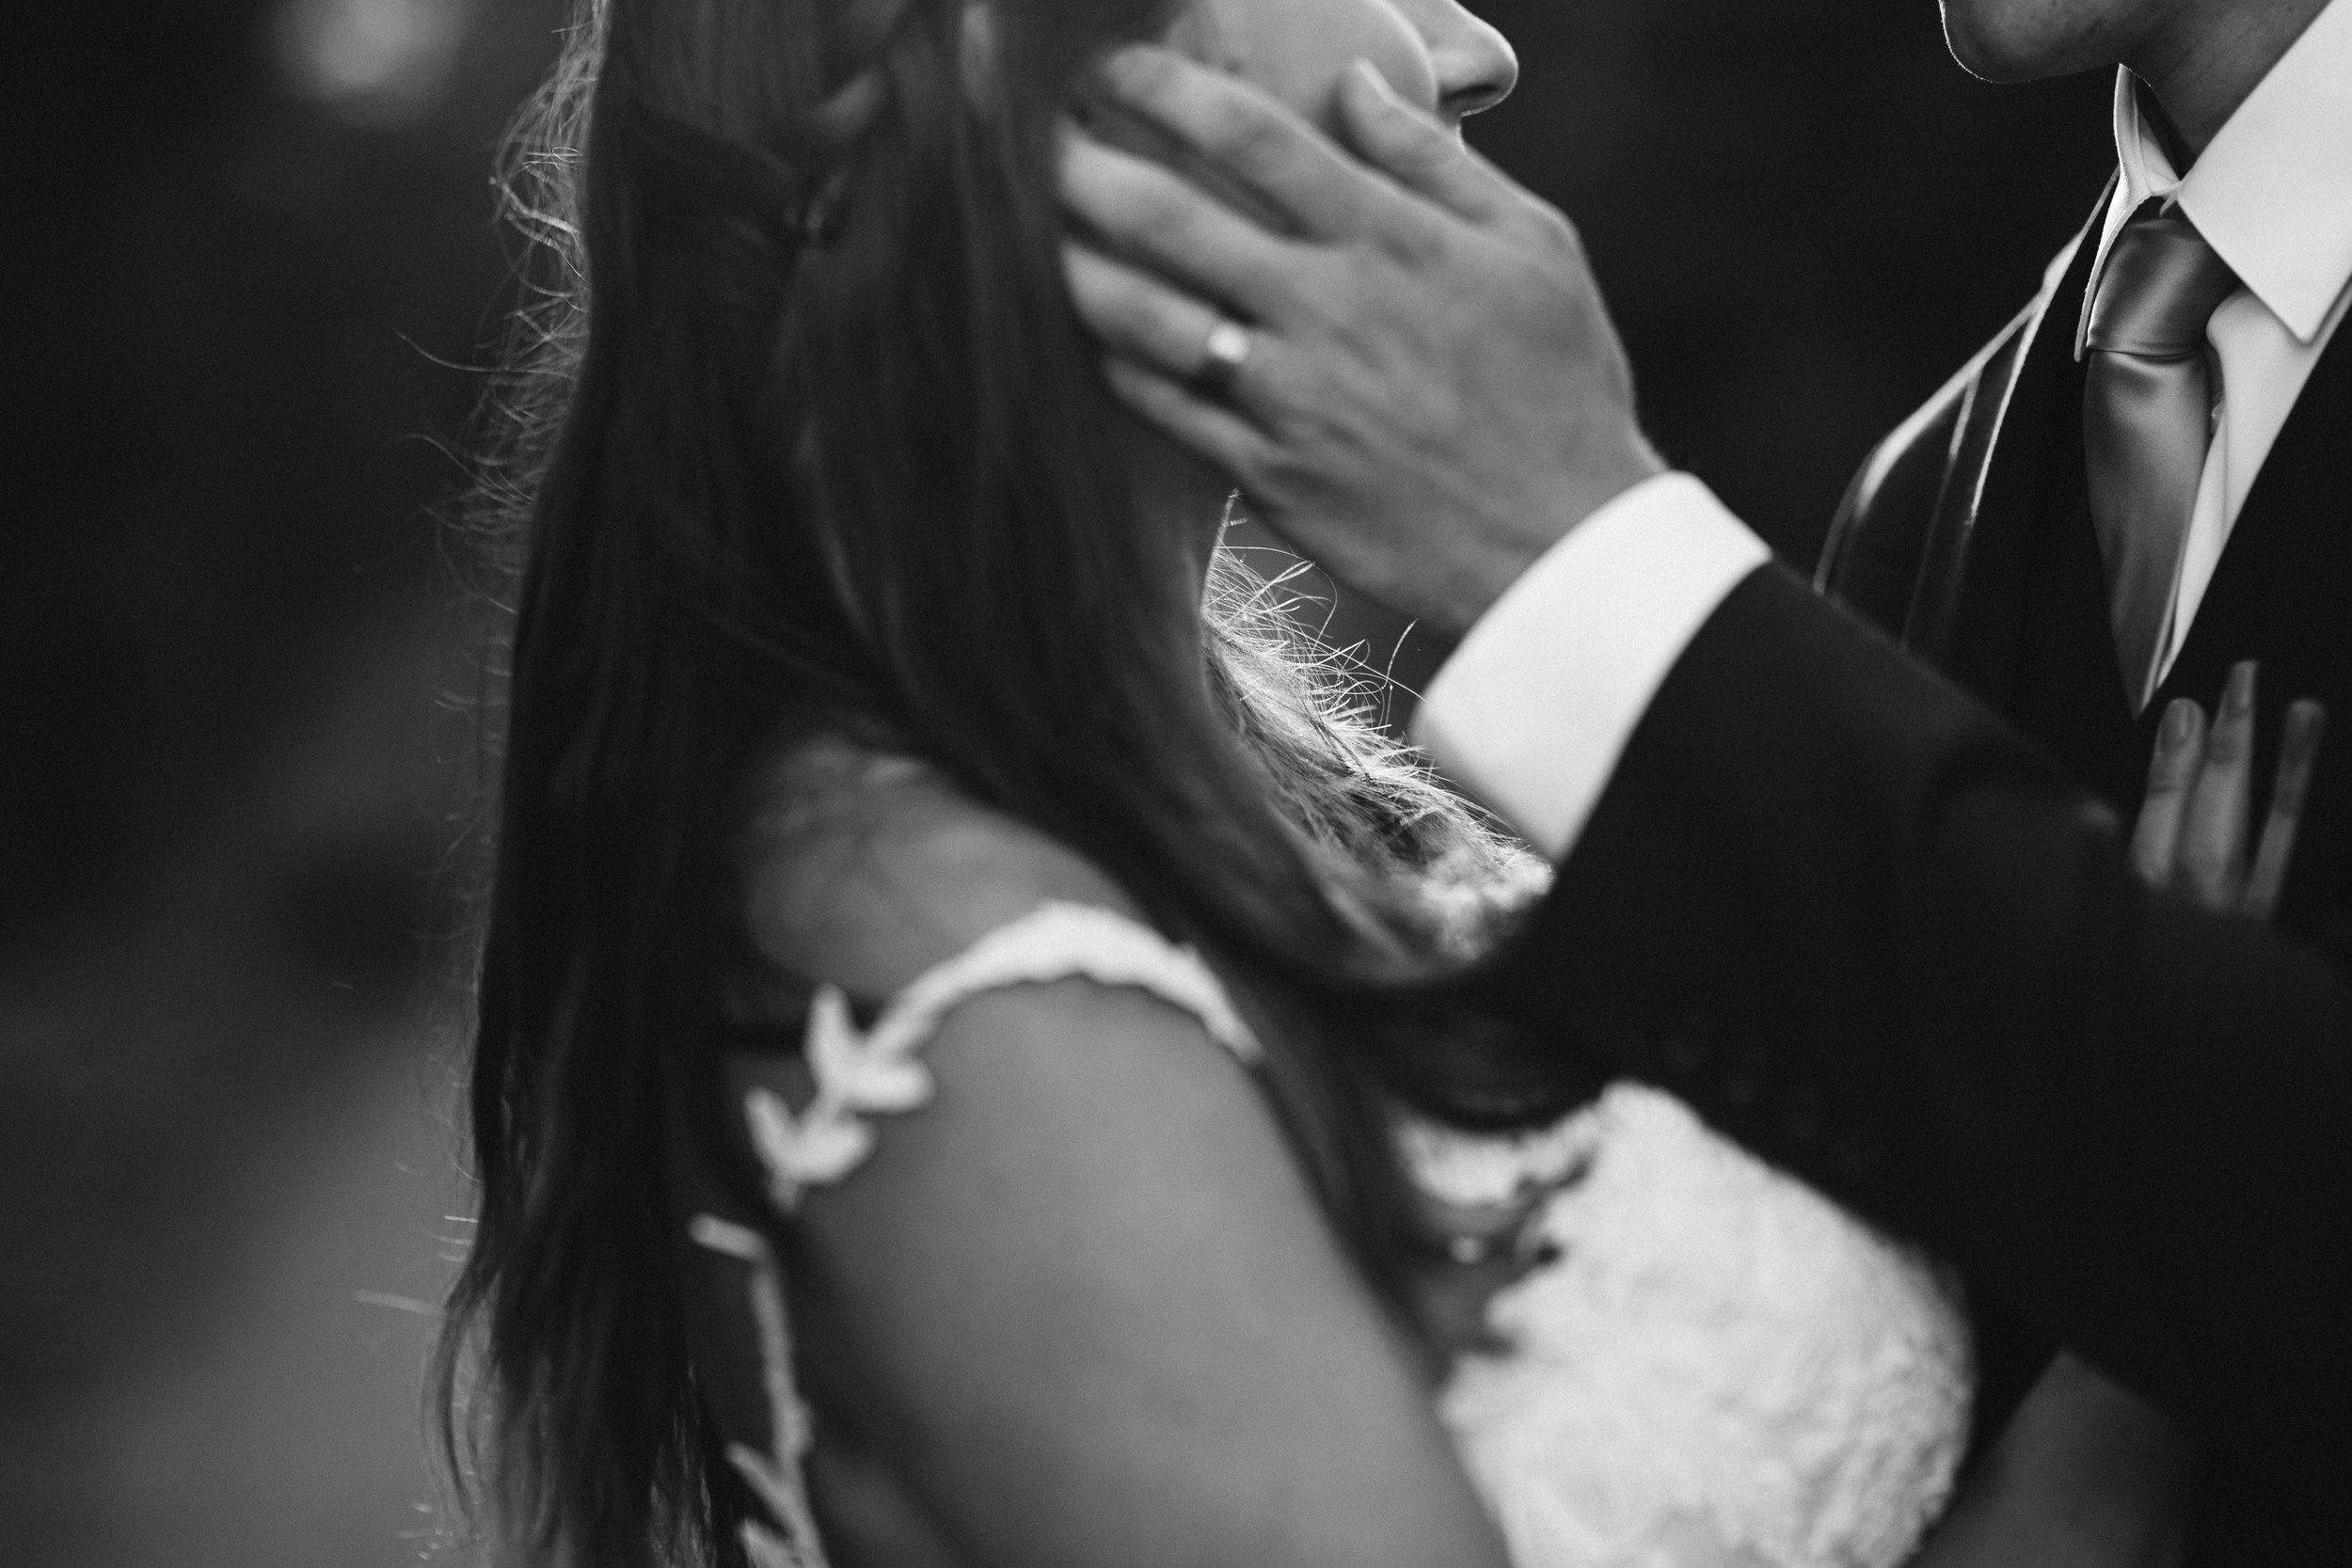 Nicole-Daacke-Photography-Mt-Rainier-elopement-photographer-washington-mountain-epic-wedding-photography-wildflowers-at-rainier-pine-tree-cloudy-summer-day-at-mountain-rainier-33.jpg